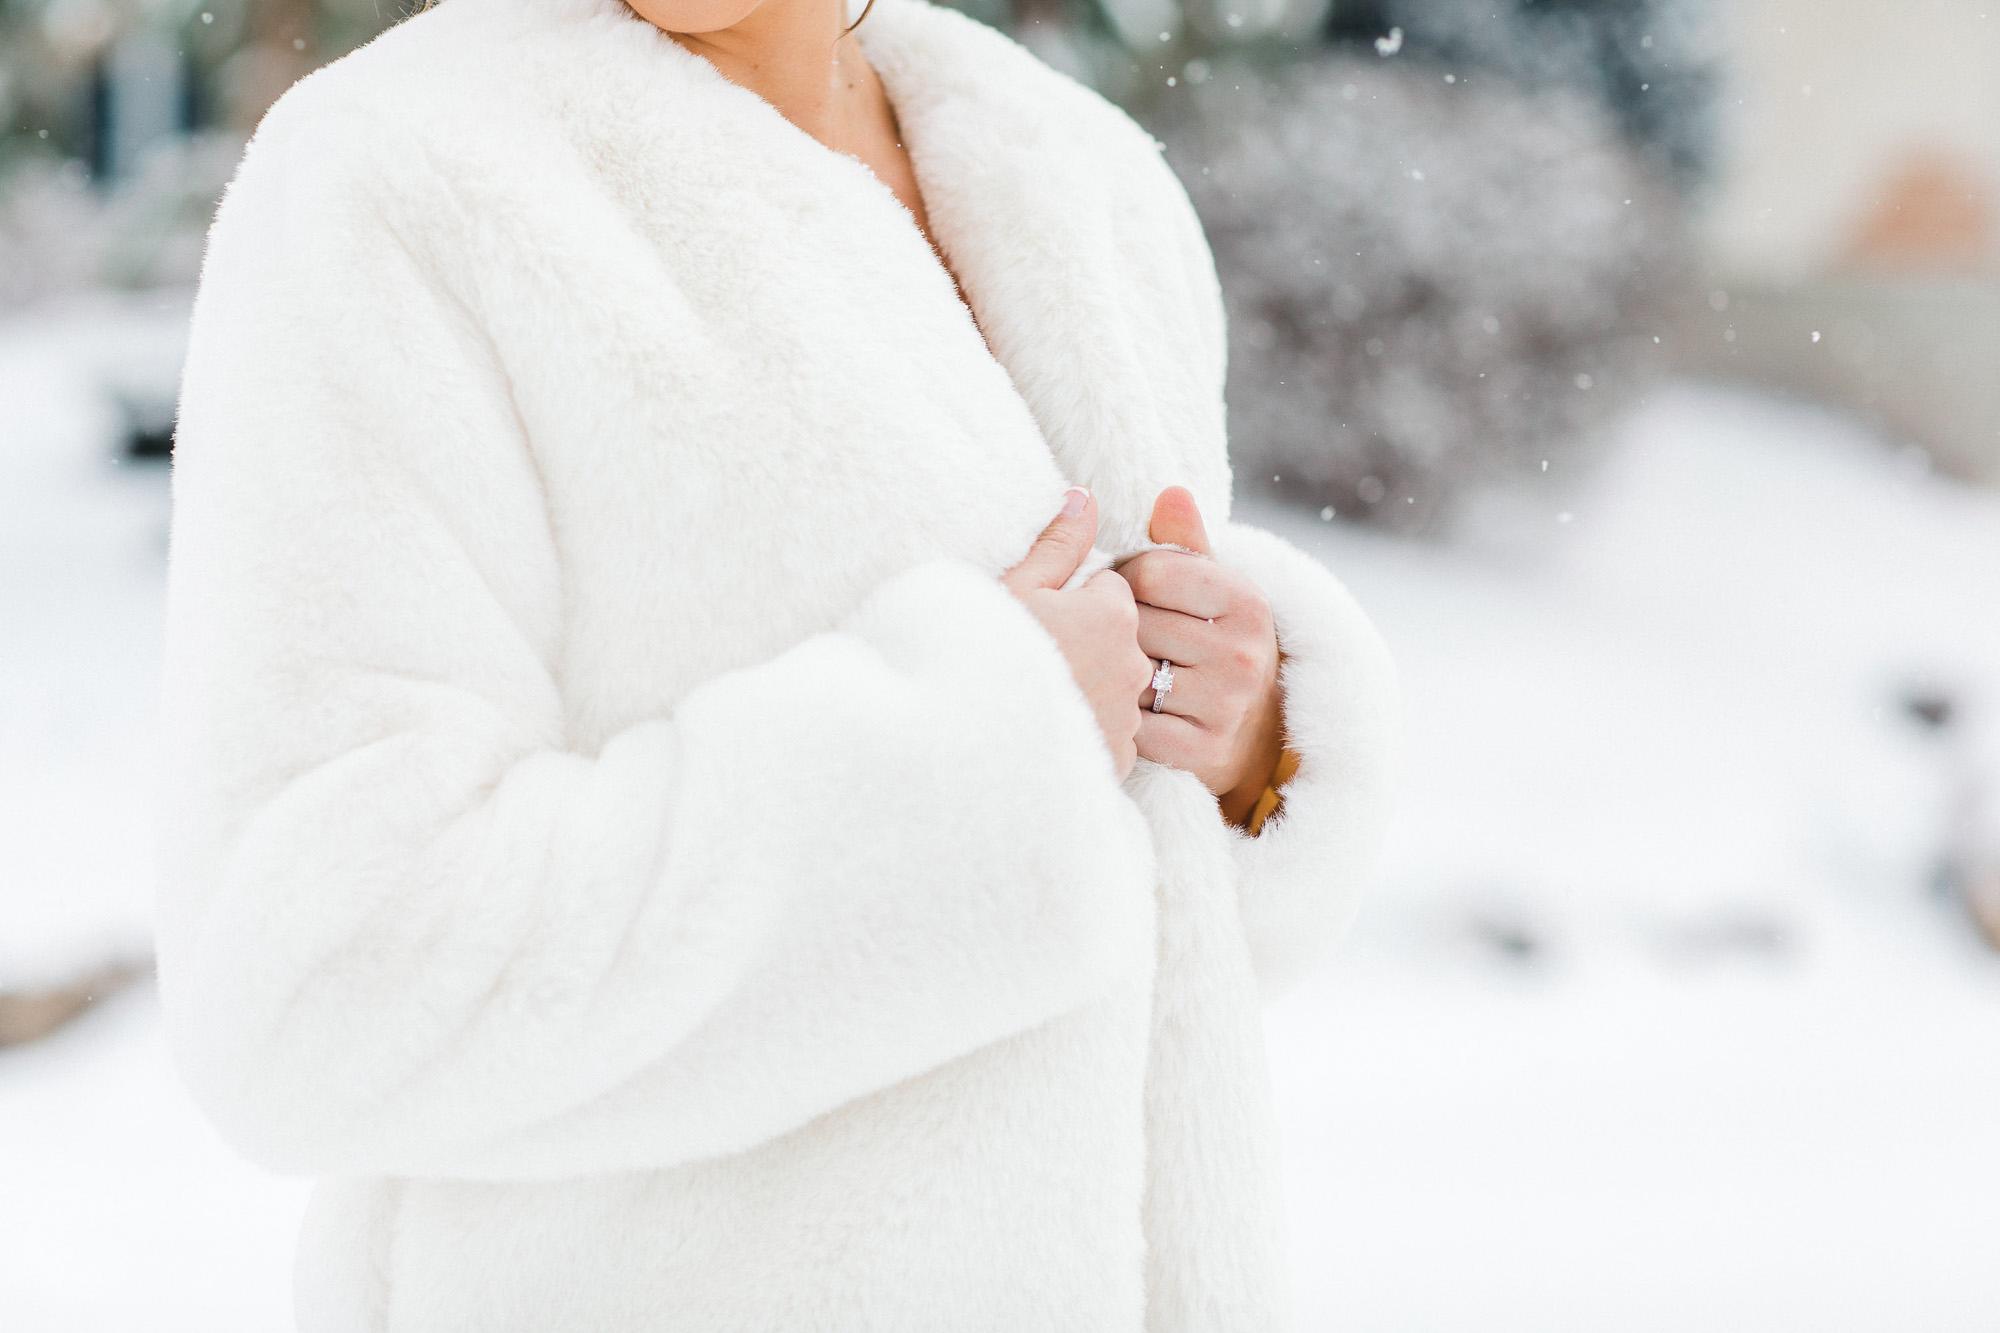 snowy-sand-springs-country-club-drums-pa-christmas-wedding-24124.jpg